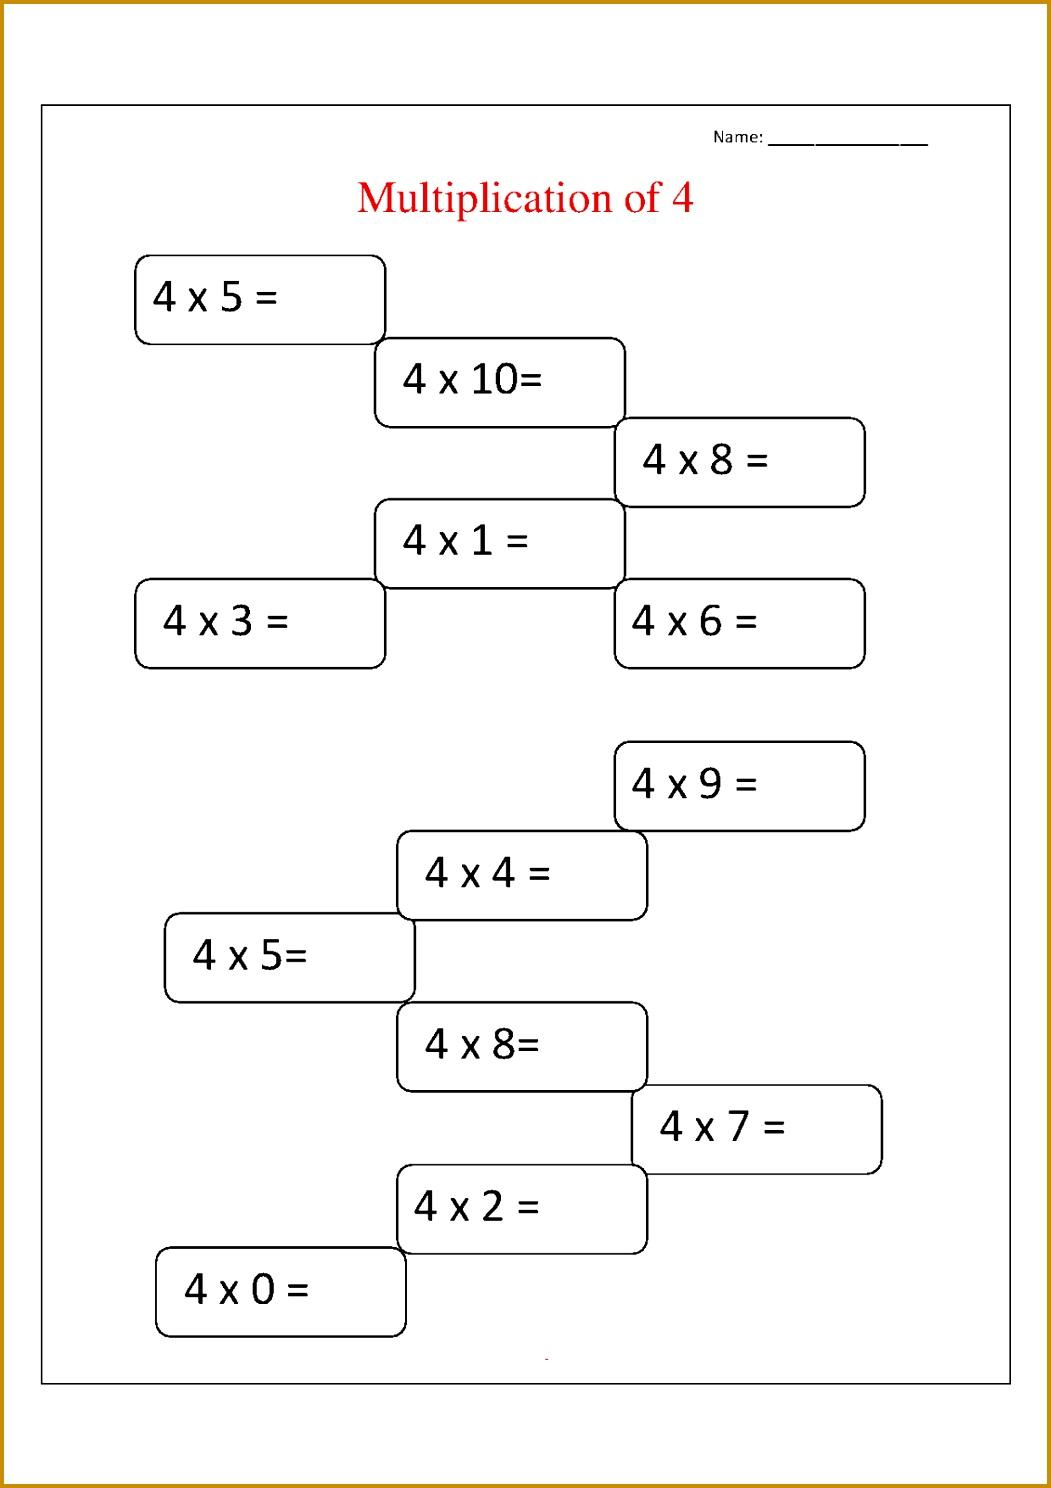 4 Times Table Worksheet for Multiplication 14881051